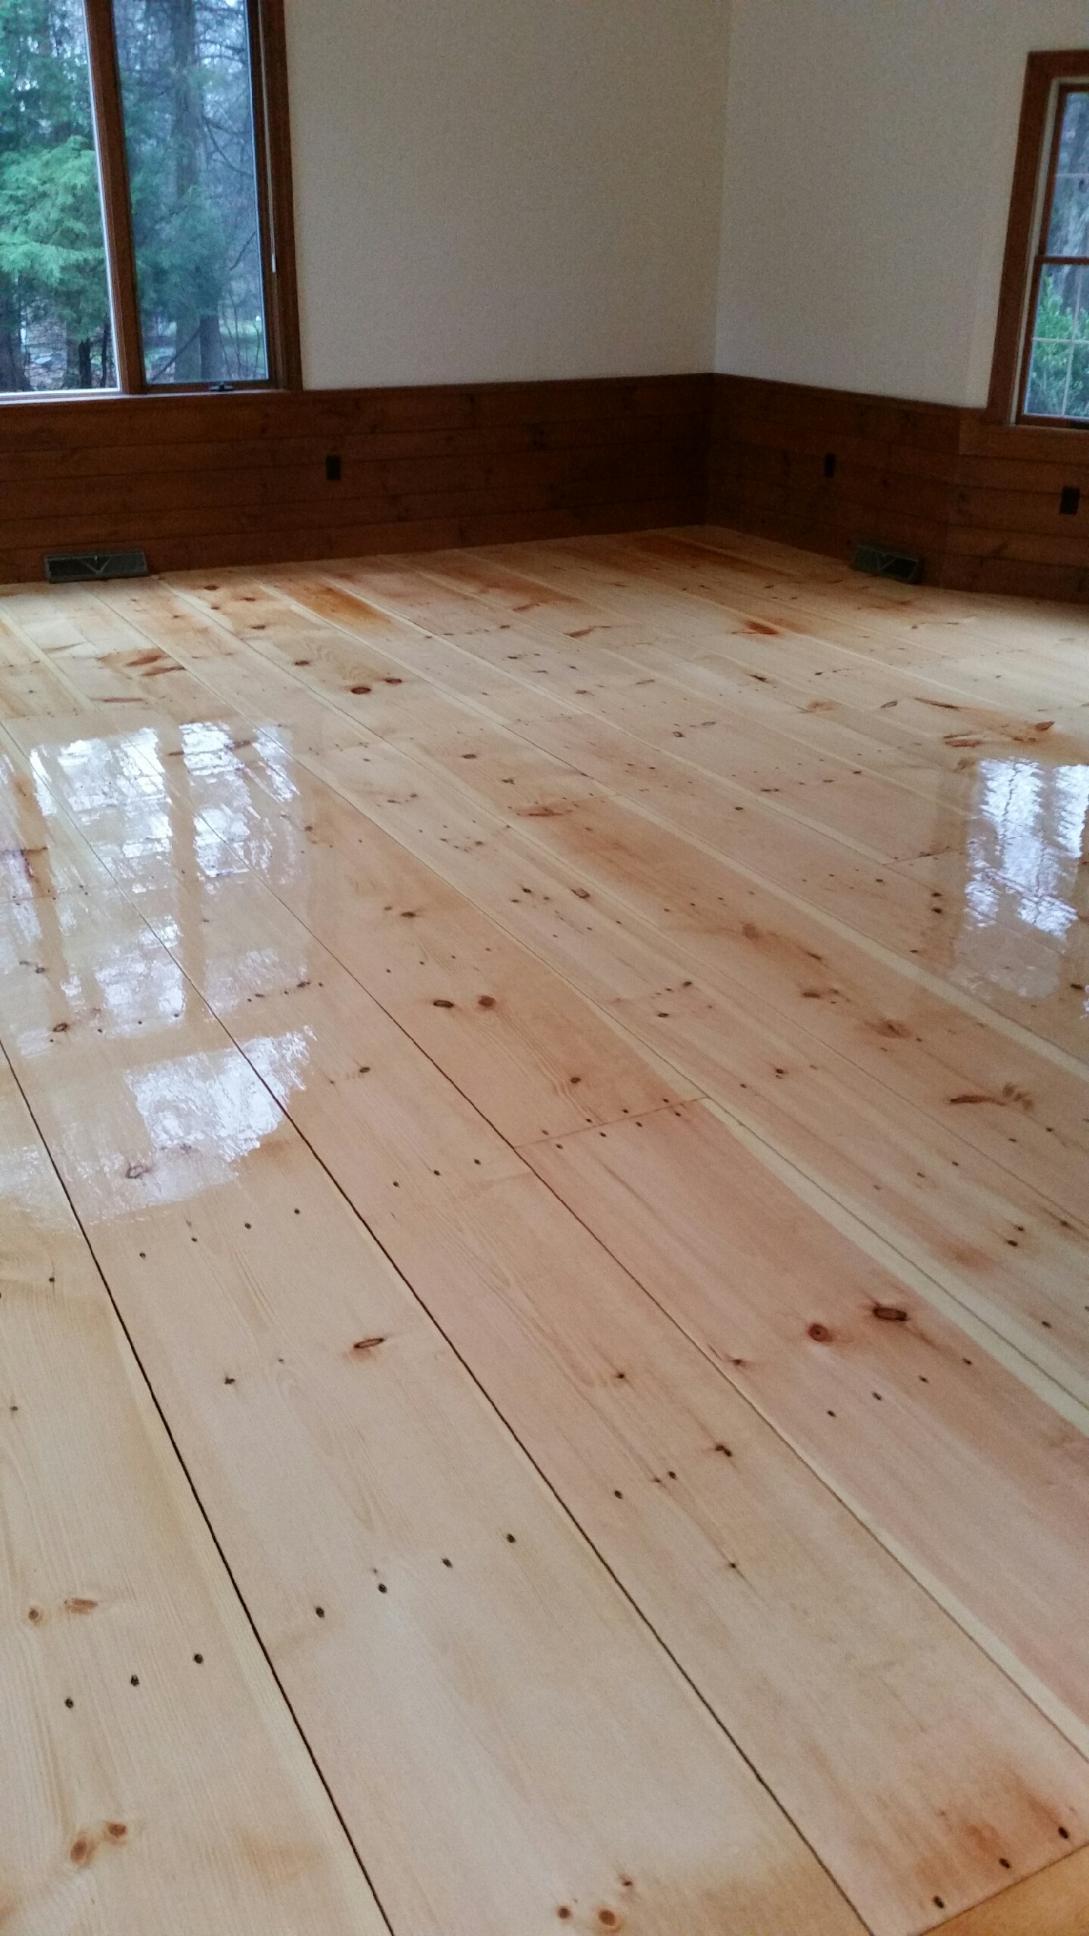 Eastern White Pine Hardwood Floors In Sudbury Ma